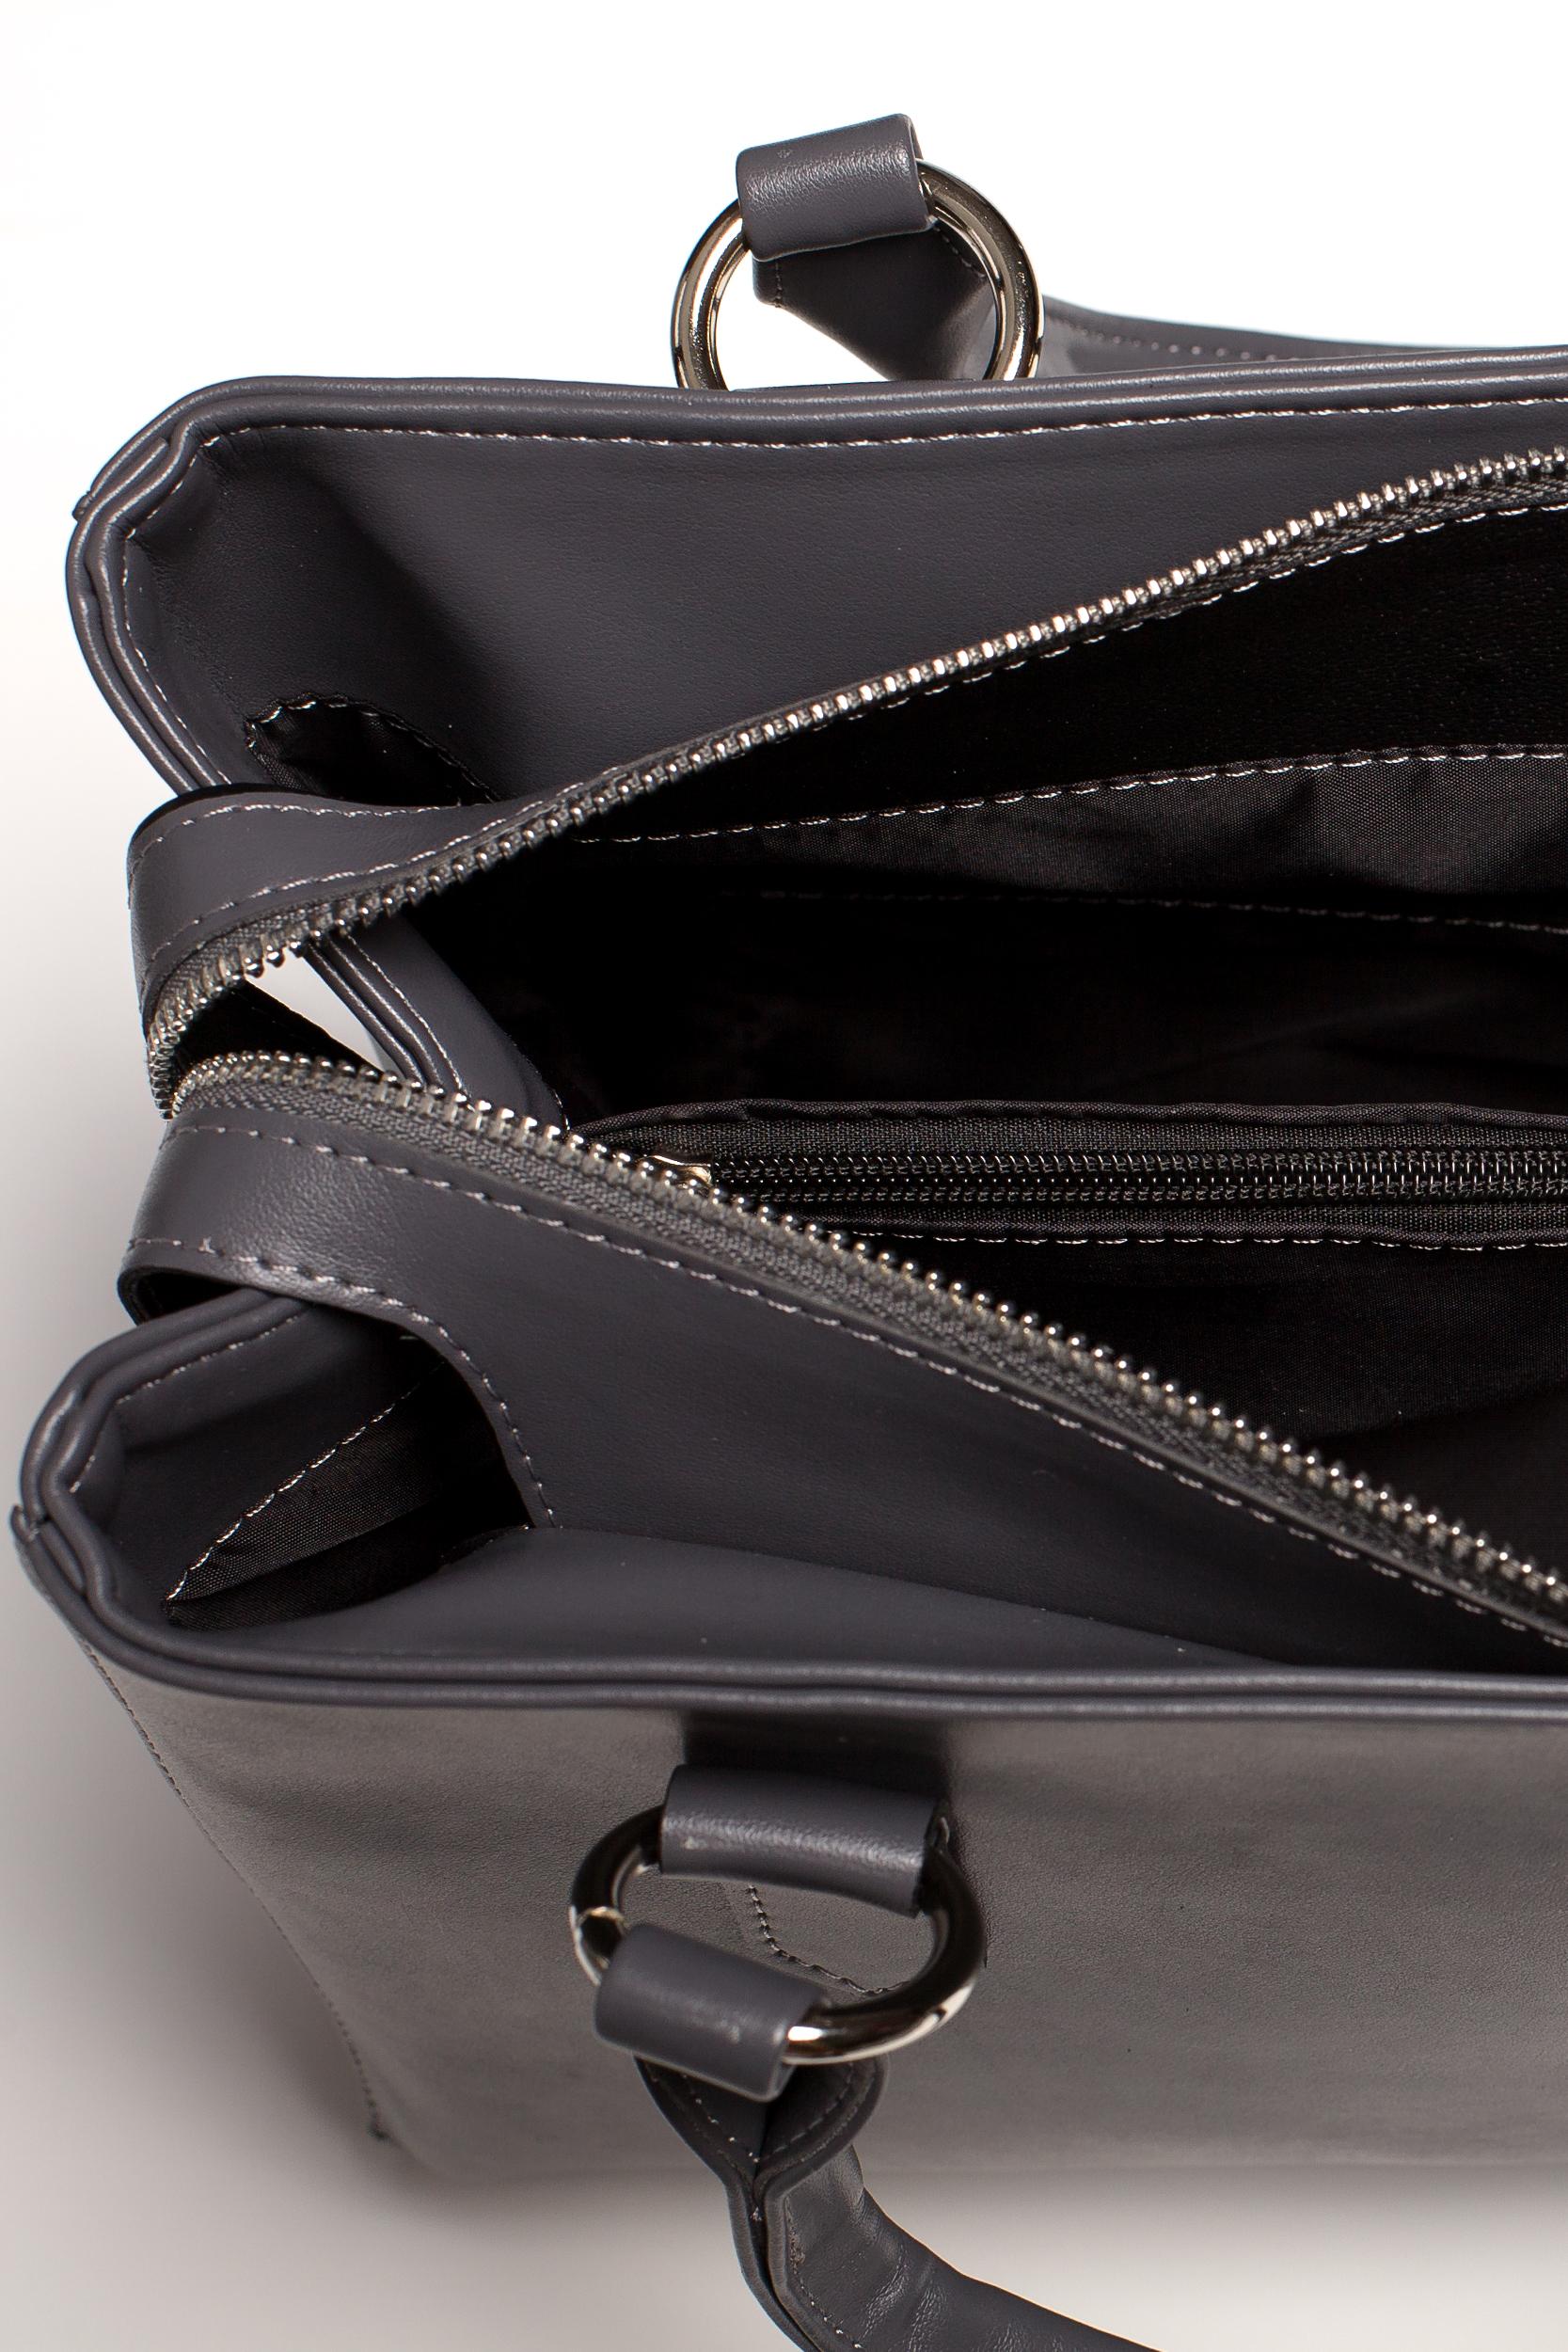 CM3576 Biurowa torebka na ramię - grafitowa